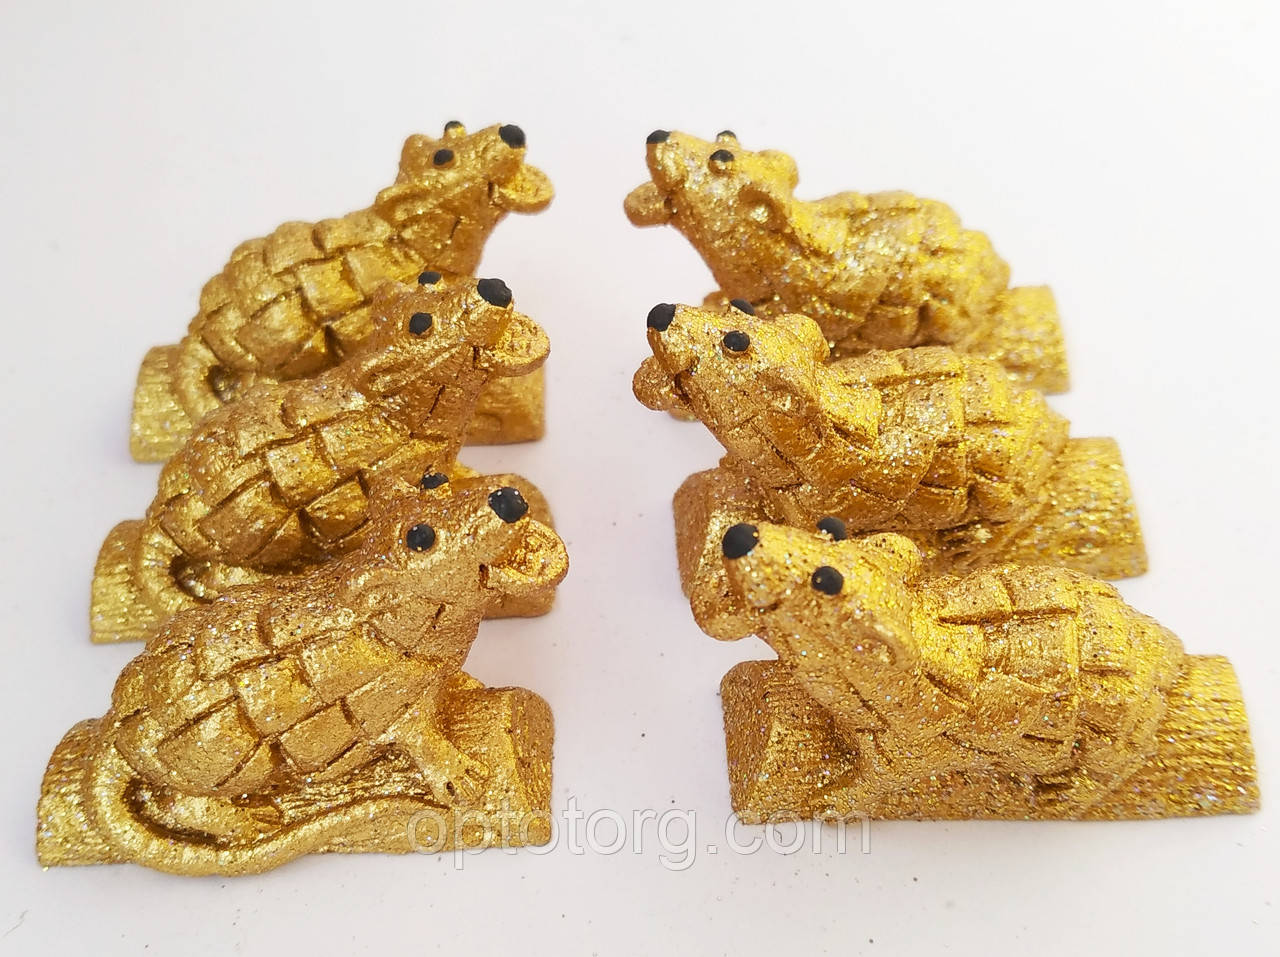 Статуэтки сувениры Мышка малютка 2,5*3,5*1,5 см